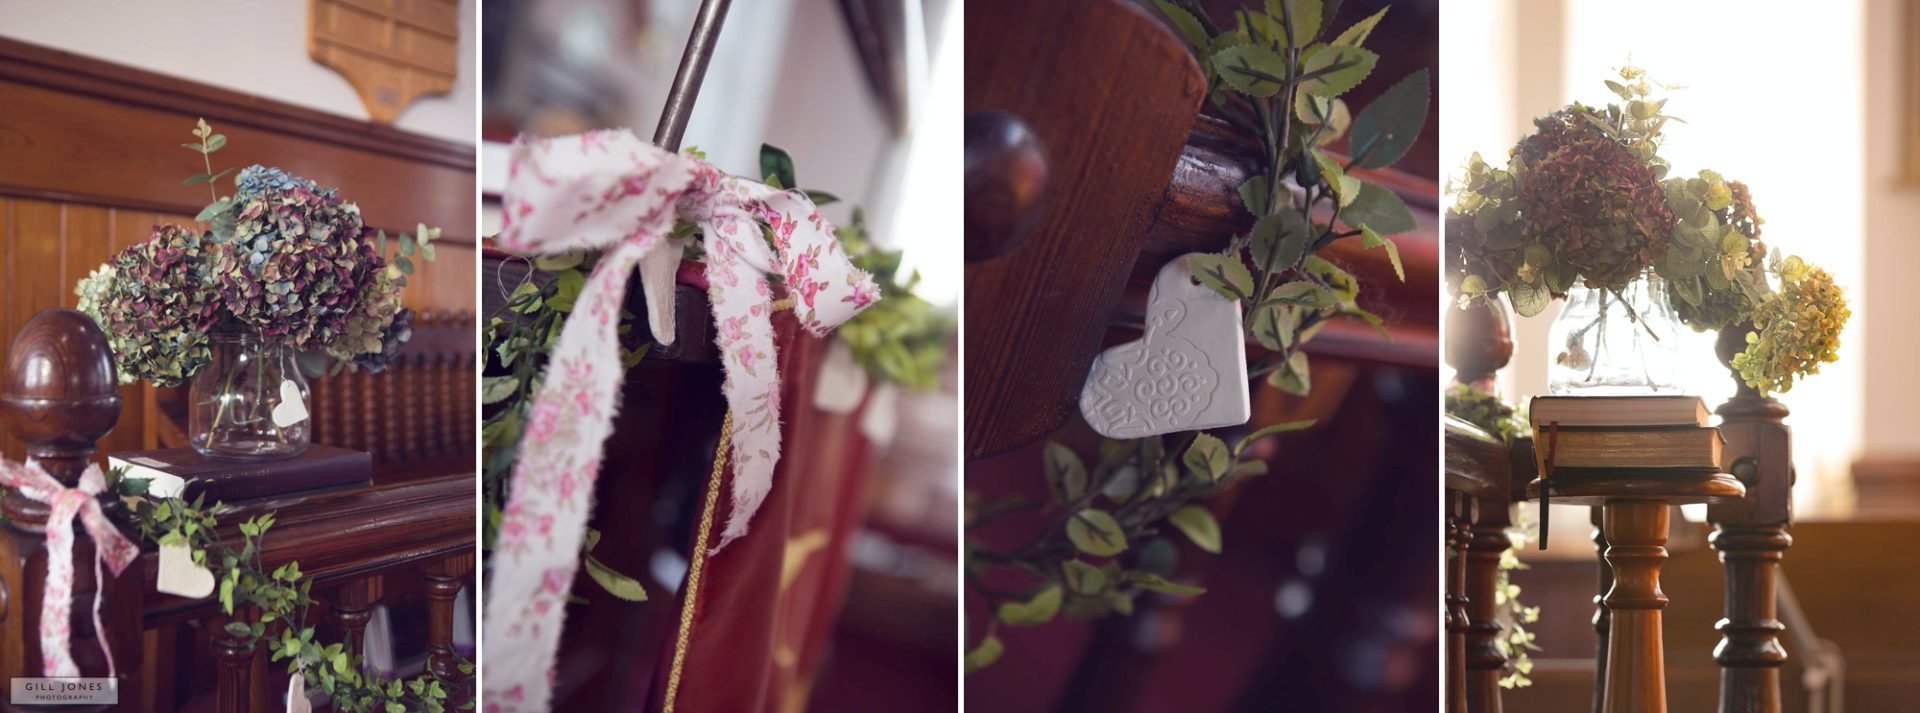 flowers displayed in Chapel